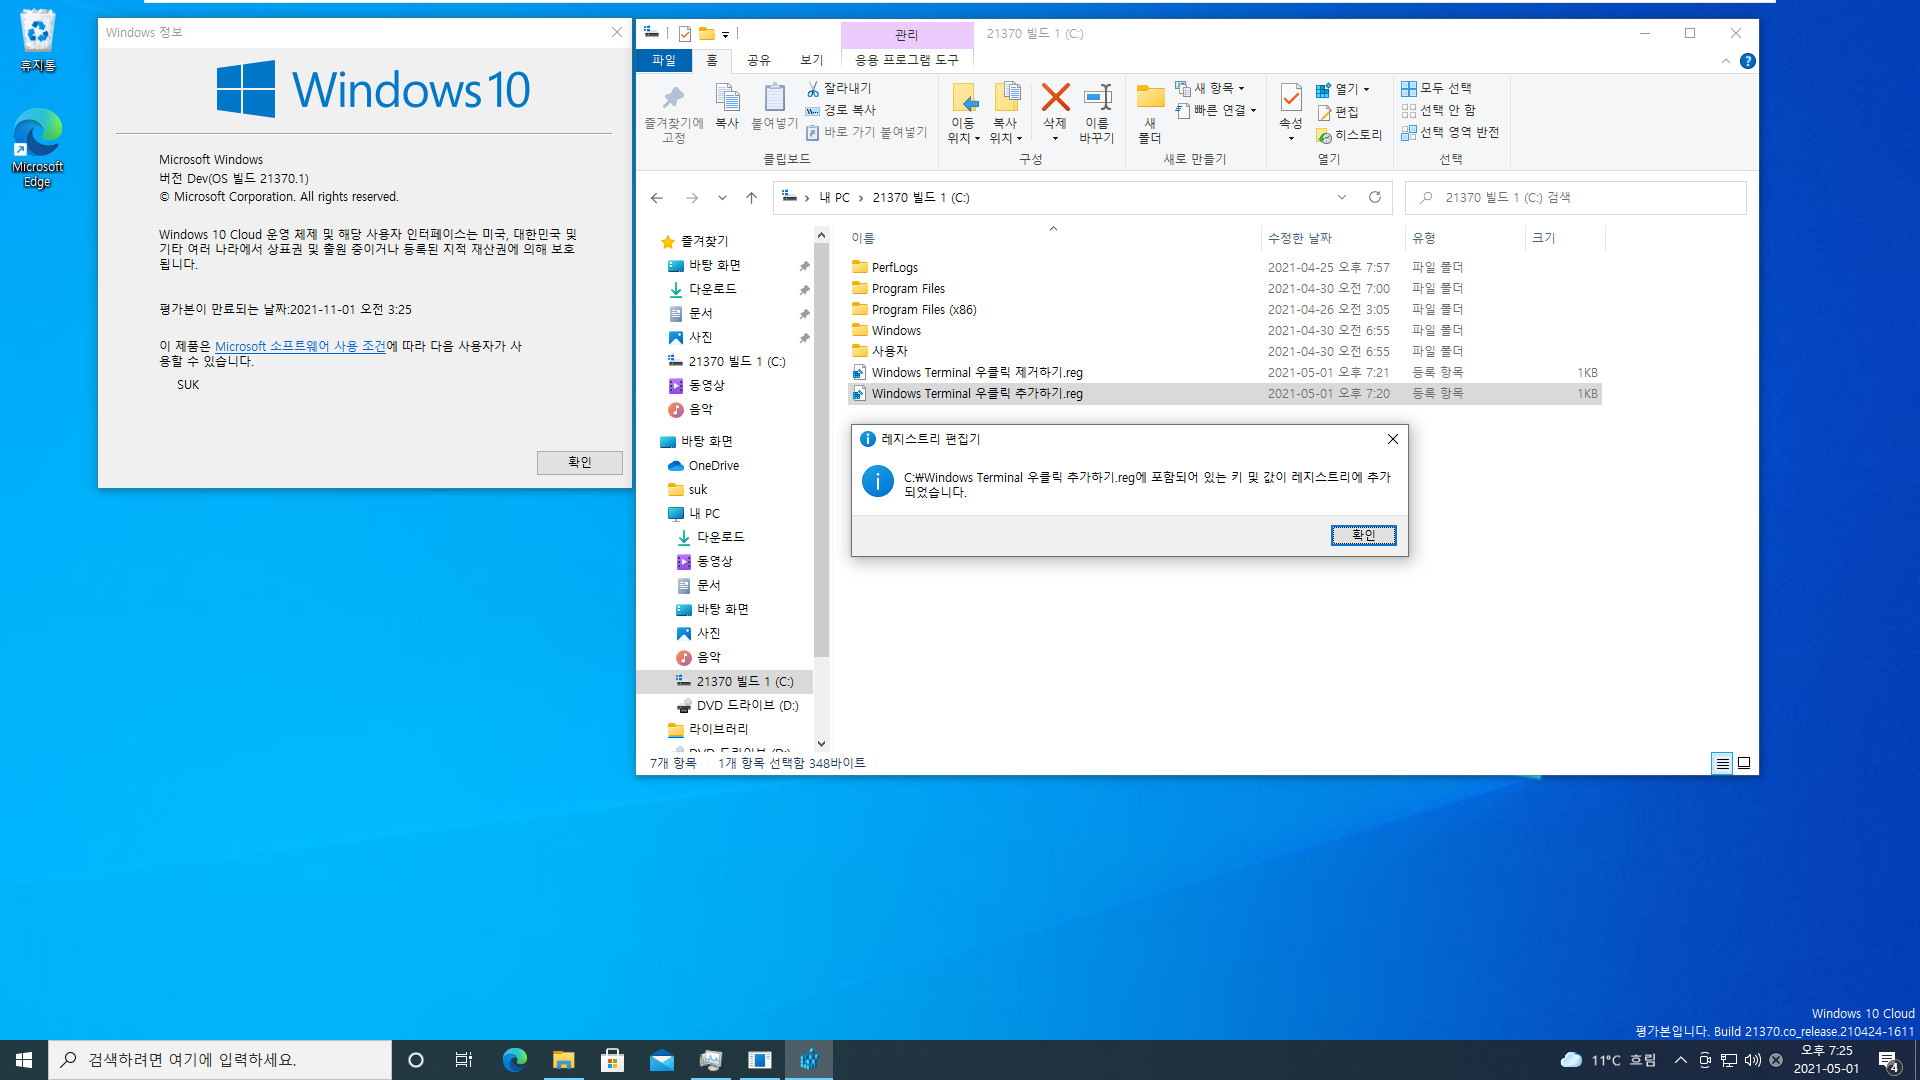 Windows Terminal 우클릭 제거하기.reg와 Windows Terminal 우클릭 추가하기.reg 테스트 2021-05-01_192539.jpg